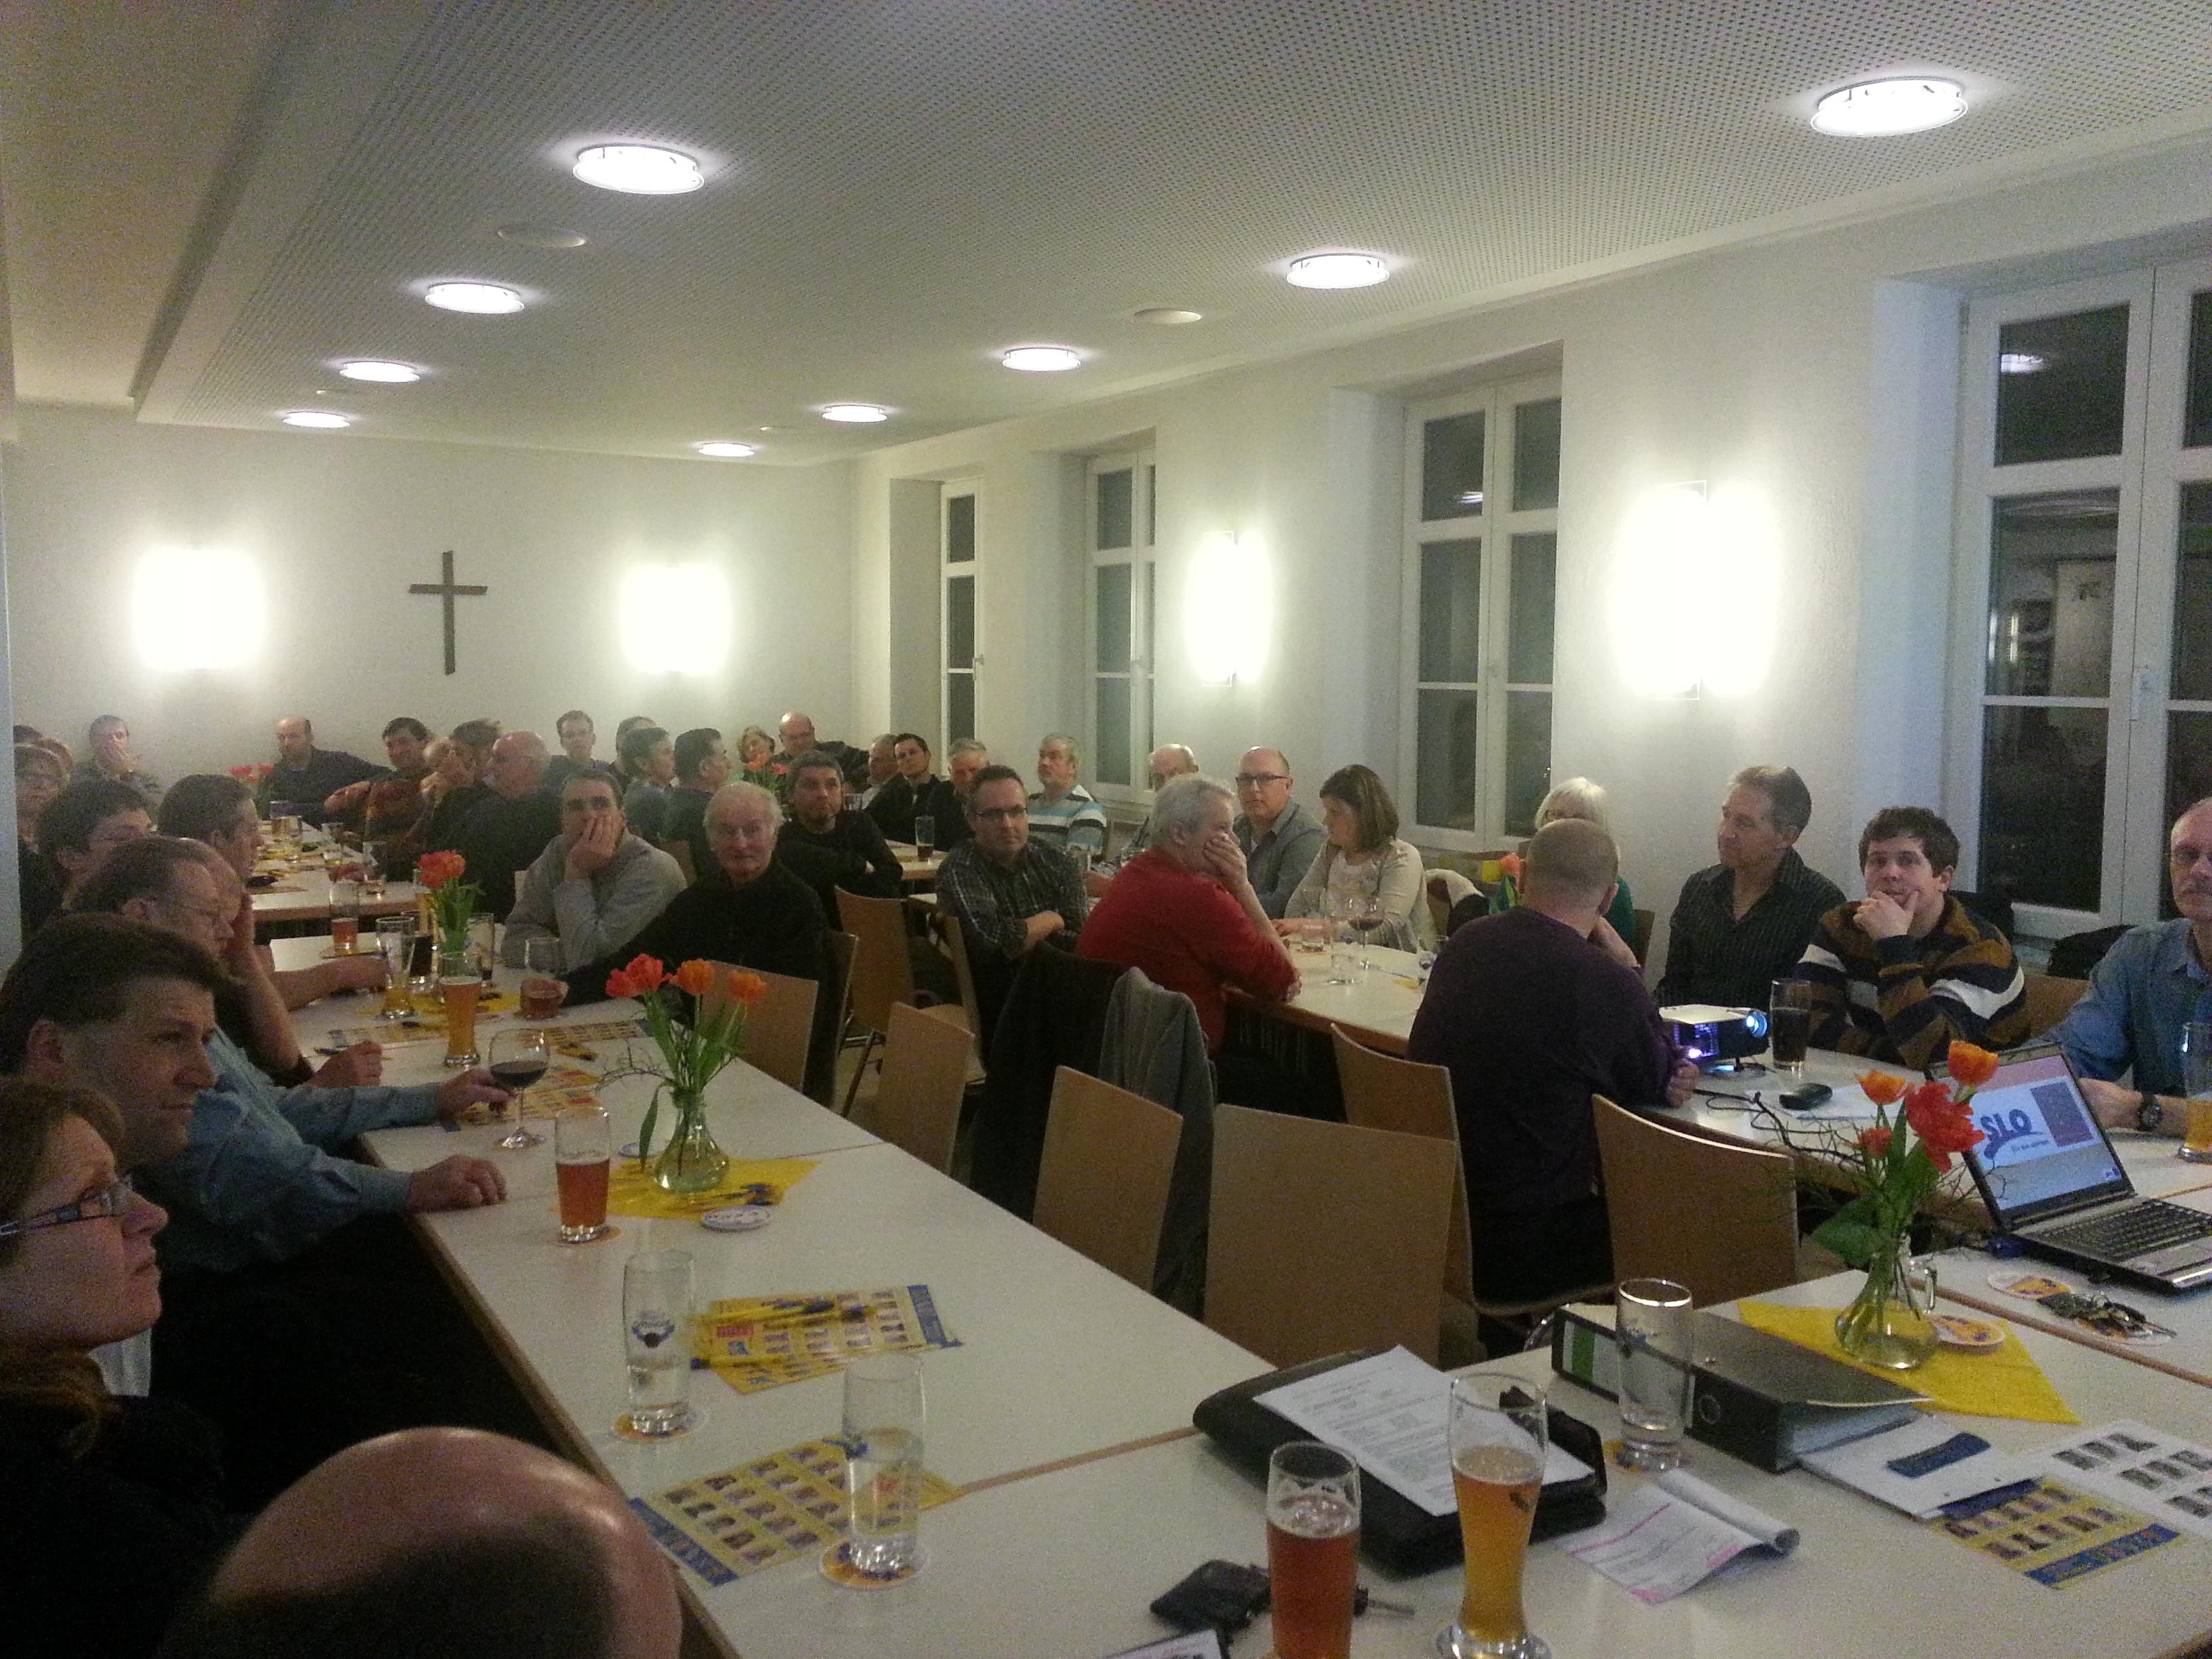 Wahlversammlung Lehmingen